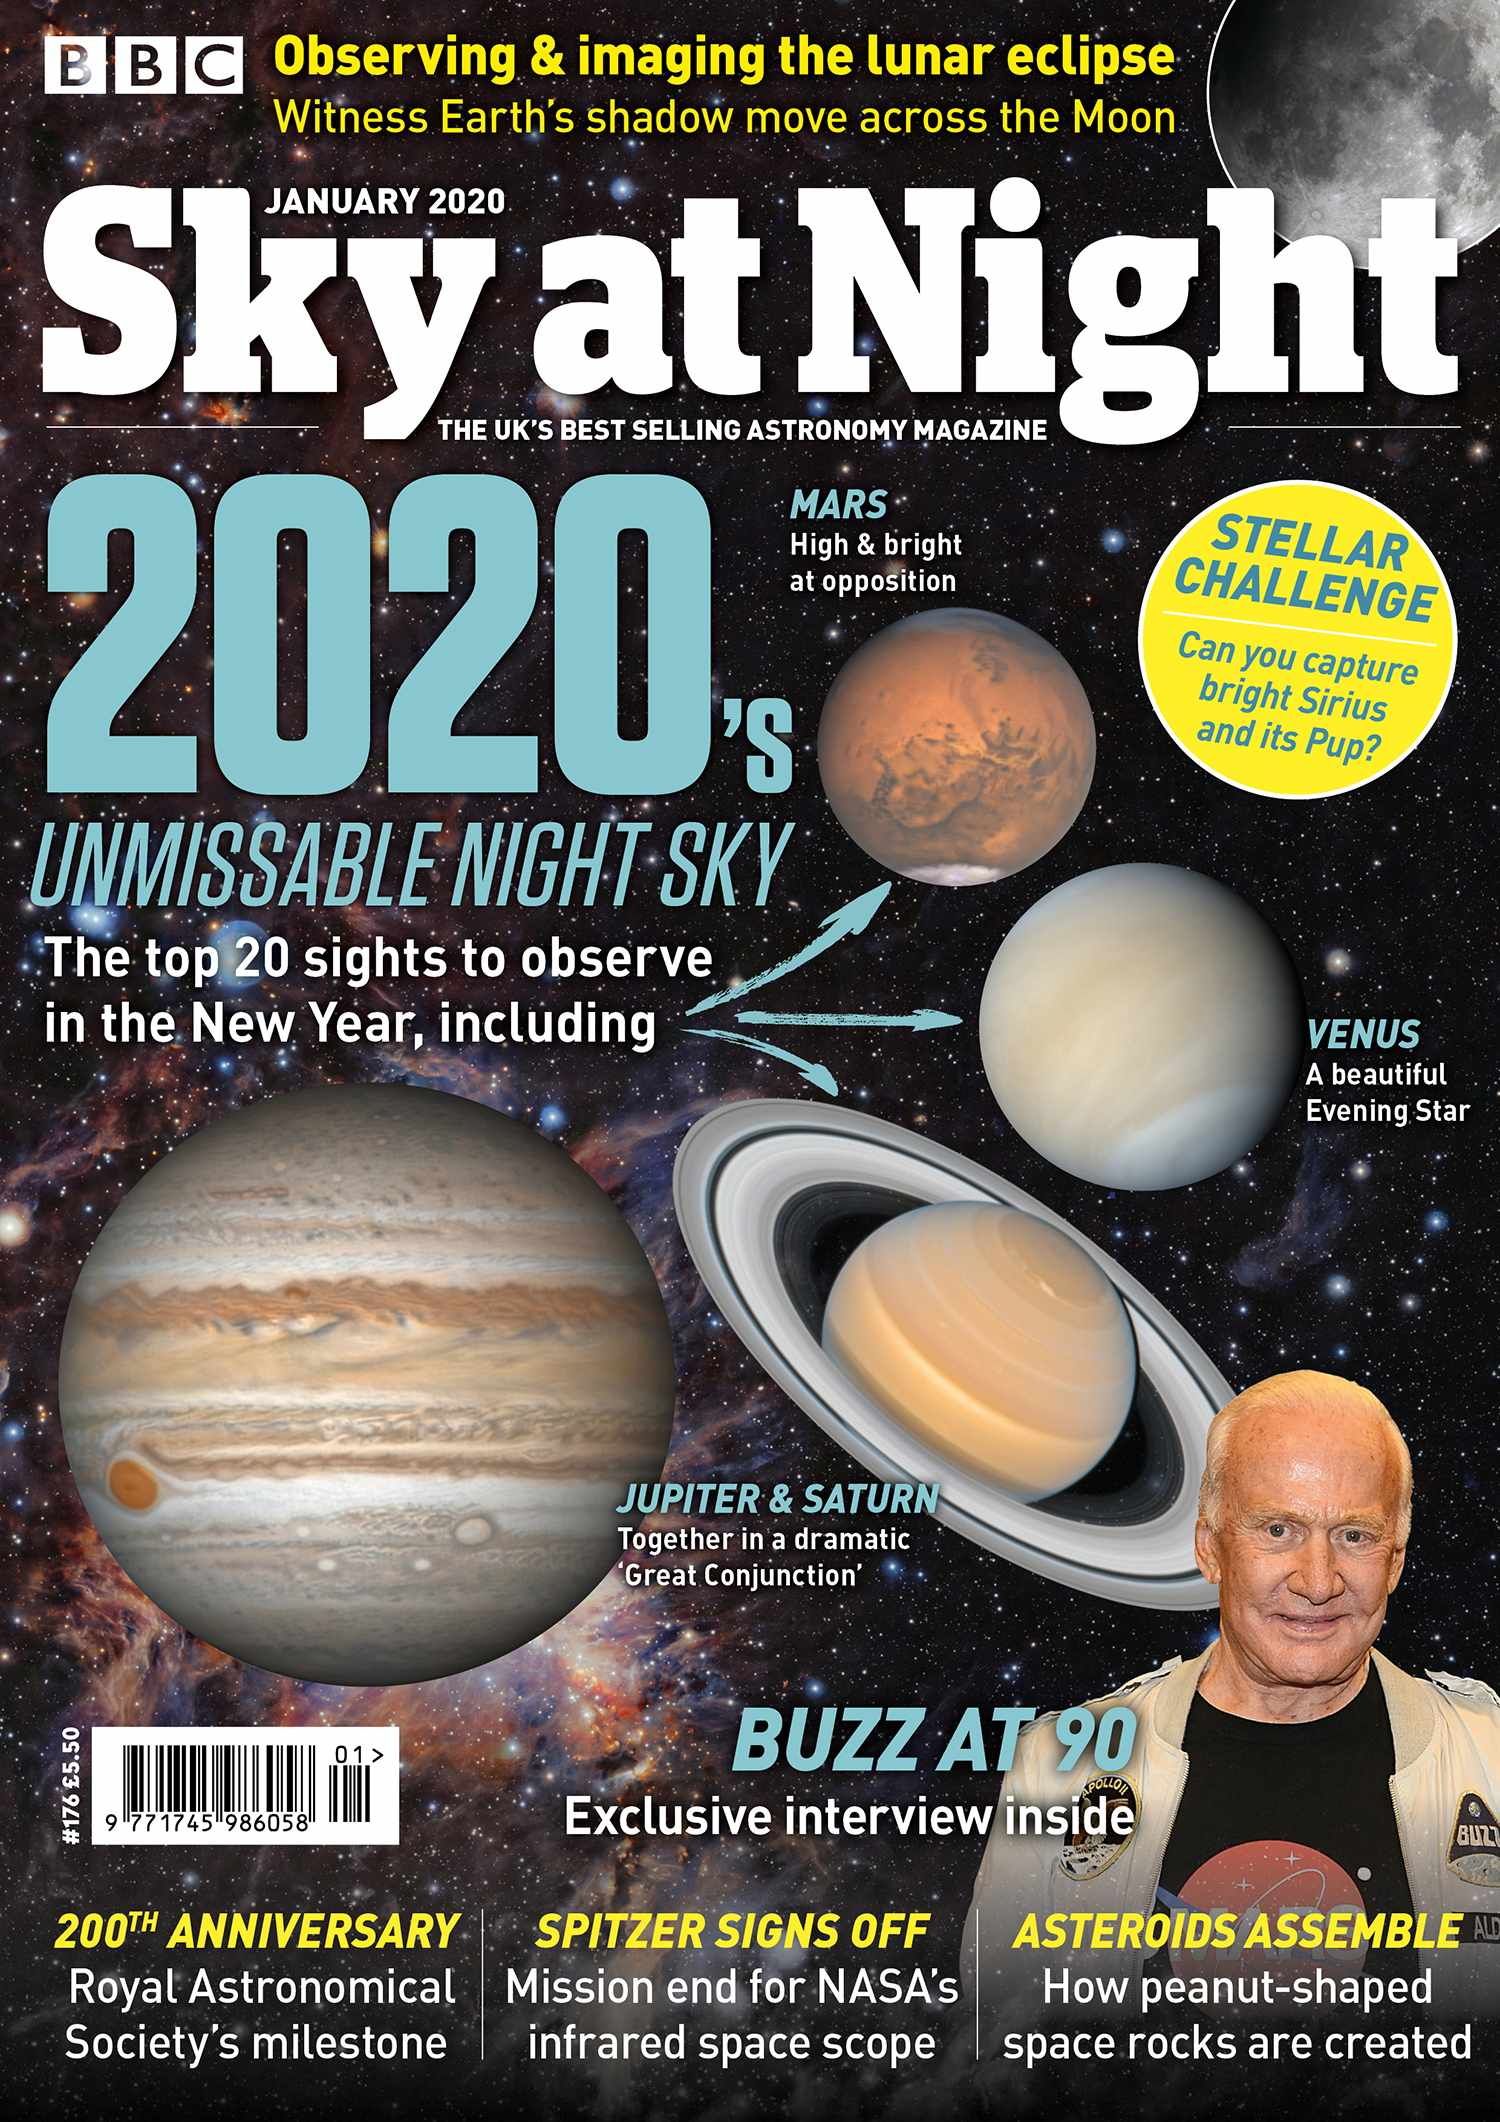 BBC Sky at Night Magazine January 2020 issue